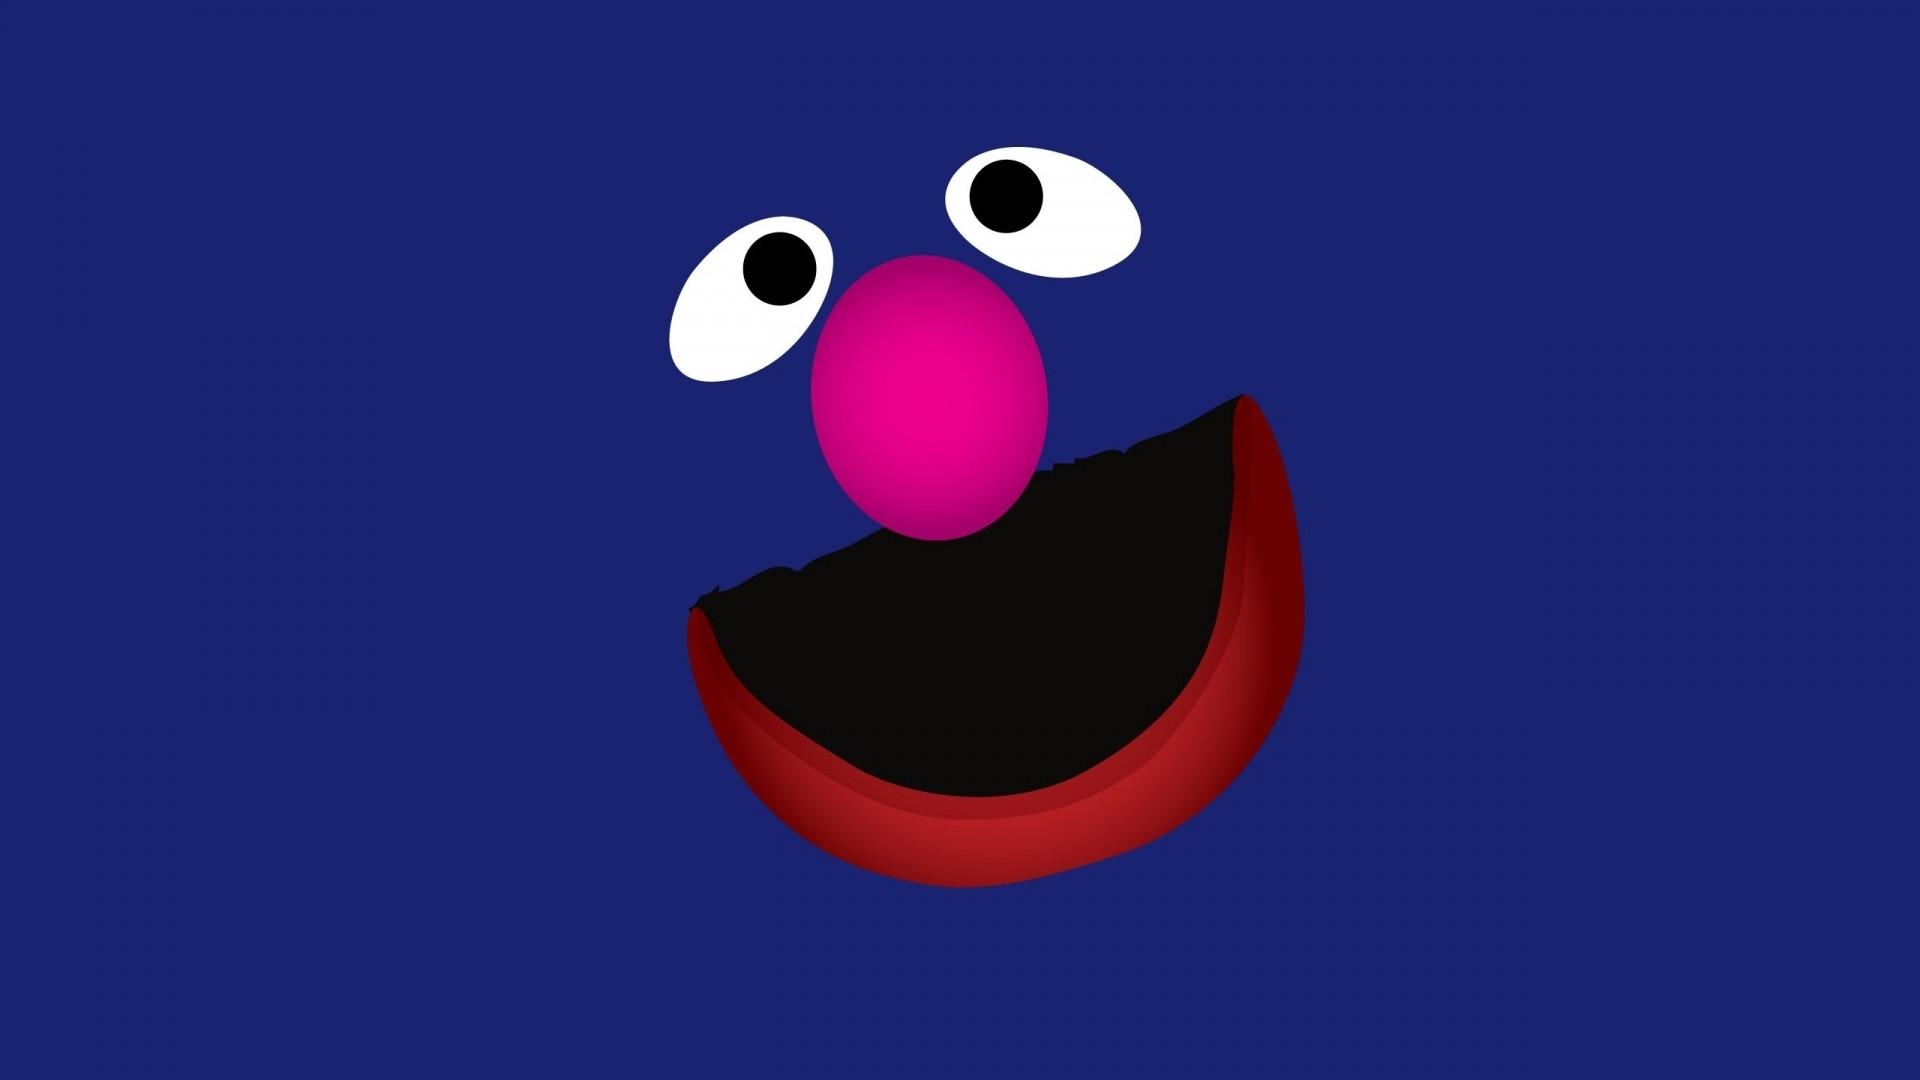 Elmo Free Wallpaper